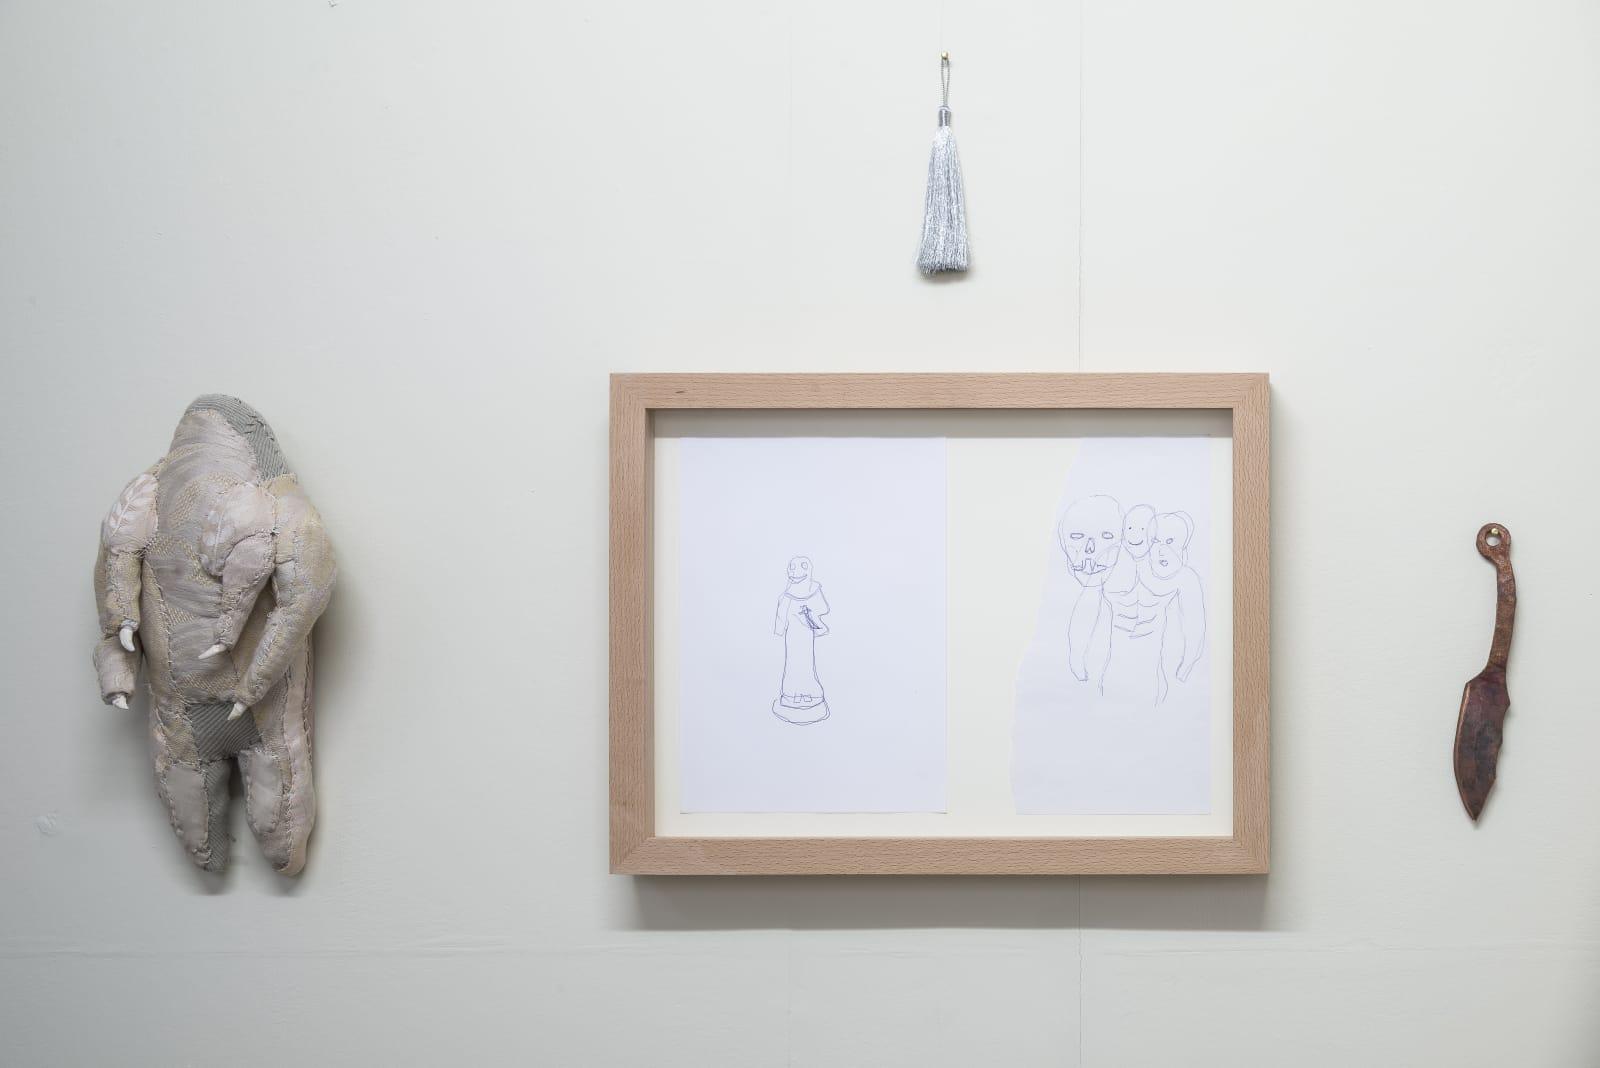 Evgeny Antufiev, Untitled, 2015, fabric sculpture and horn, cm 38 x 19 x 11, drawing cm 39 x 51.3 x 5, knife bronze cm 24 x 4, tassel cm 18